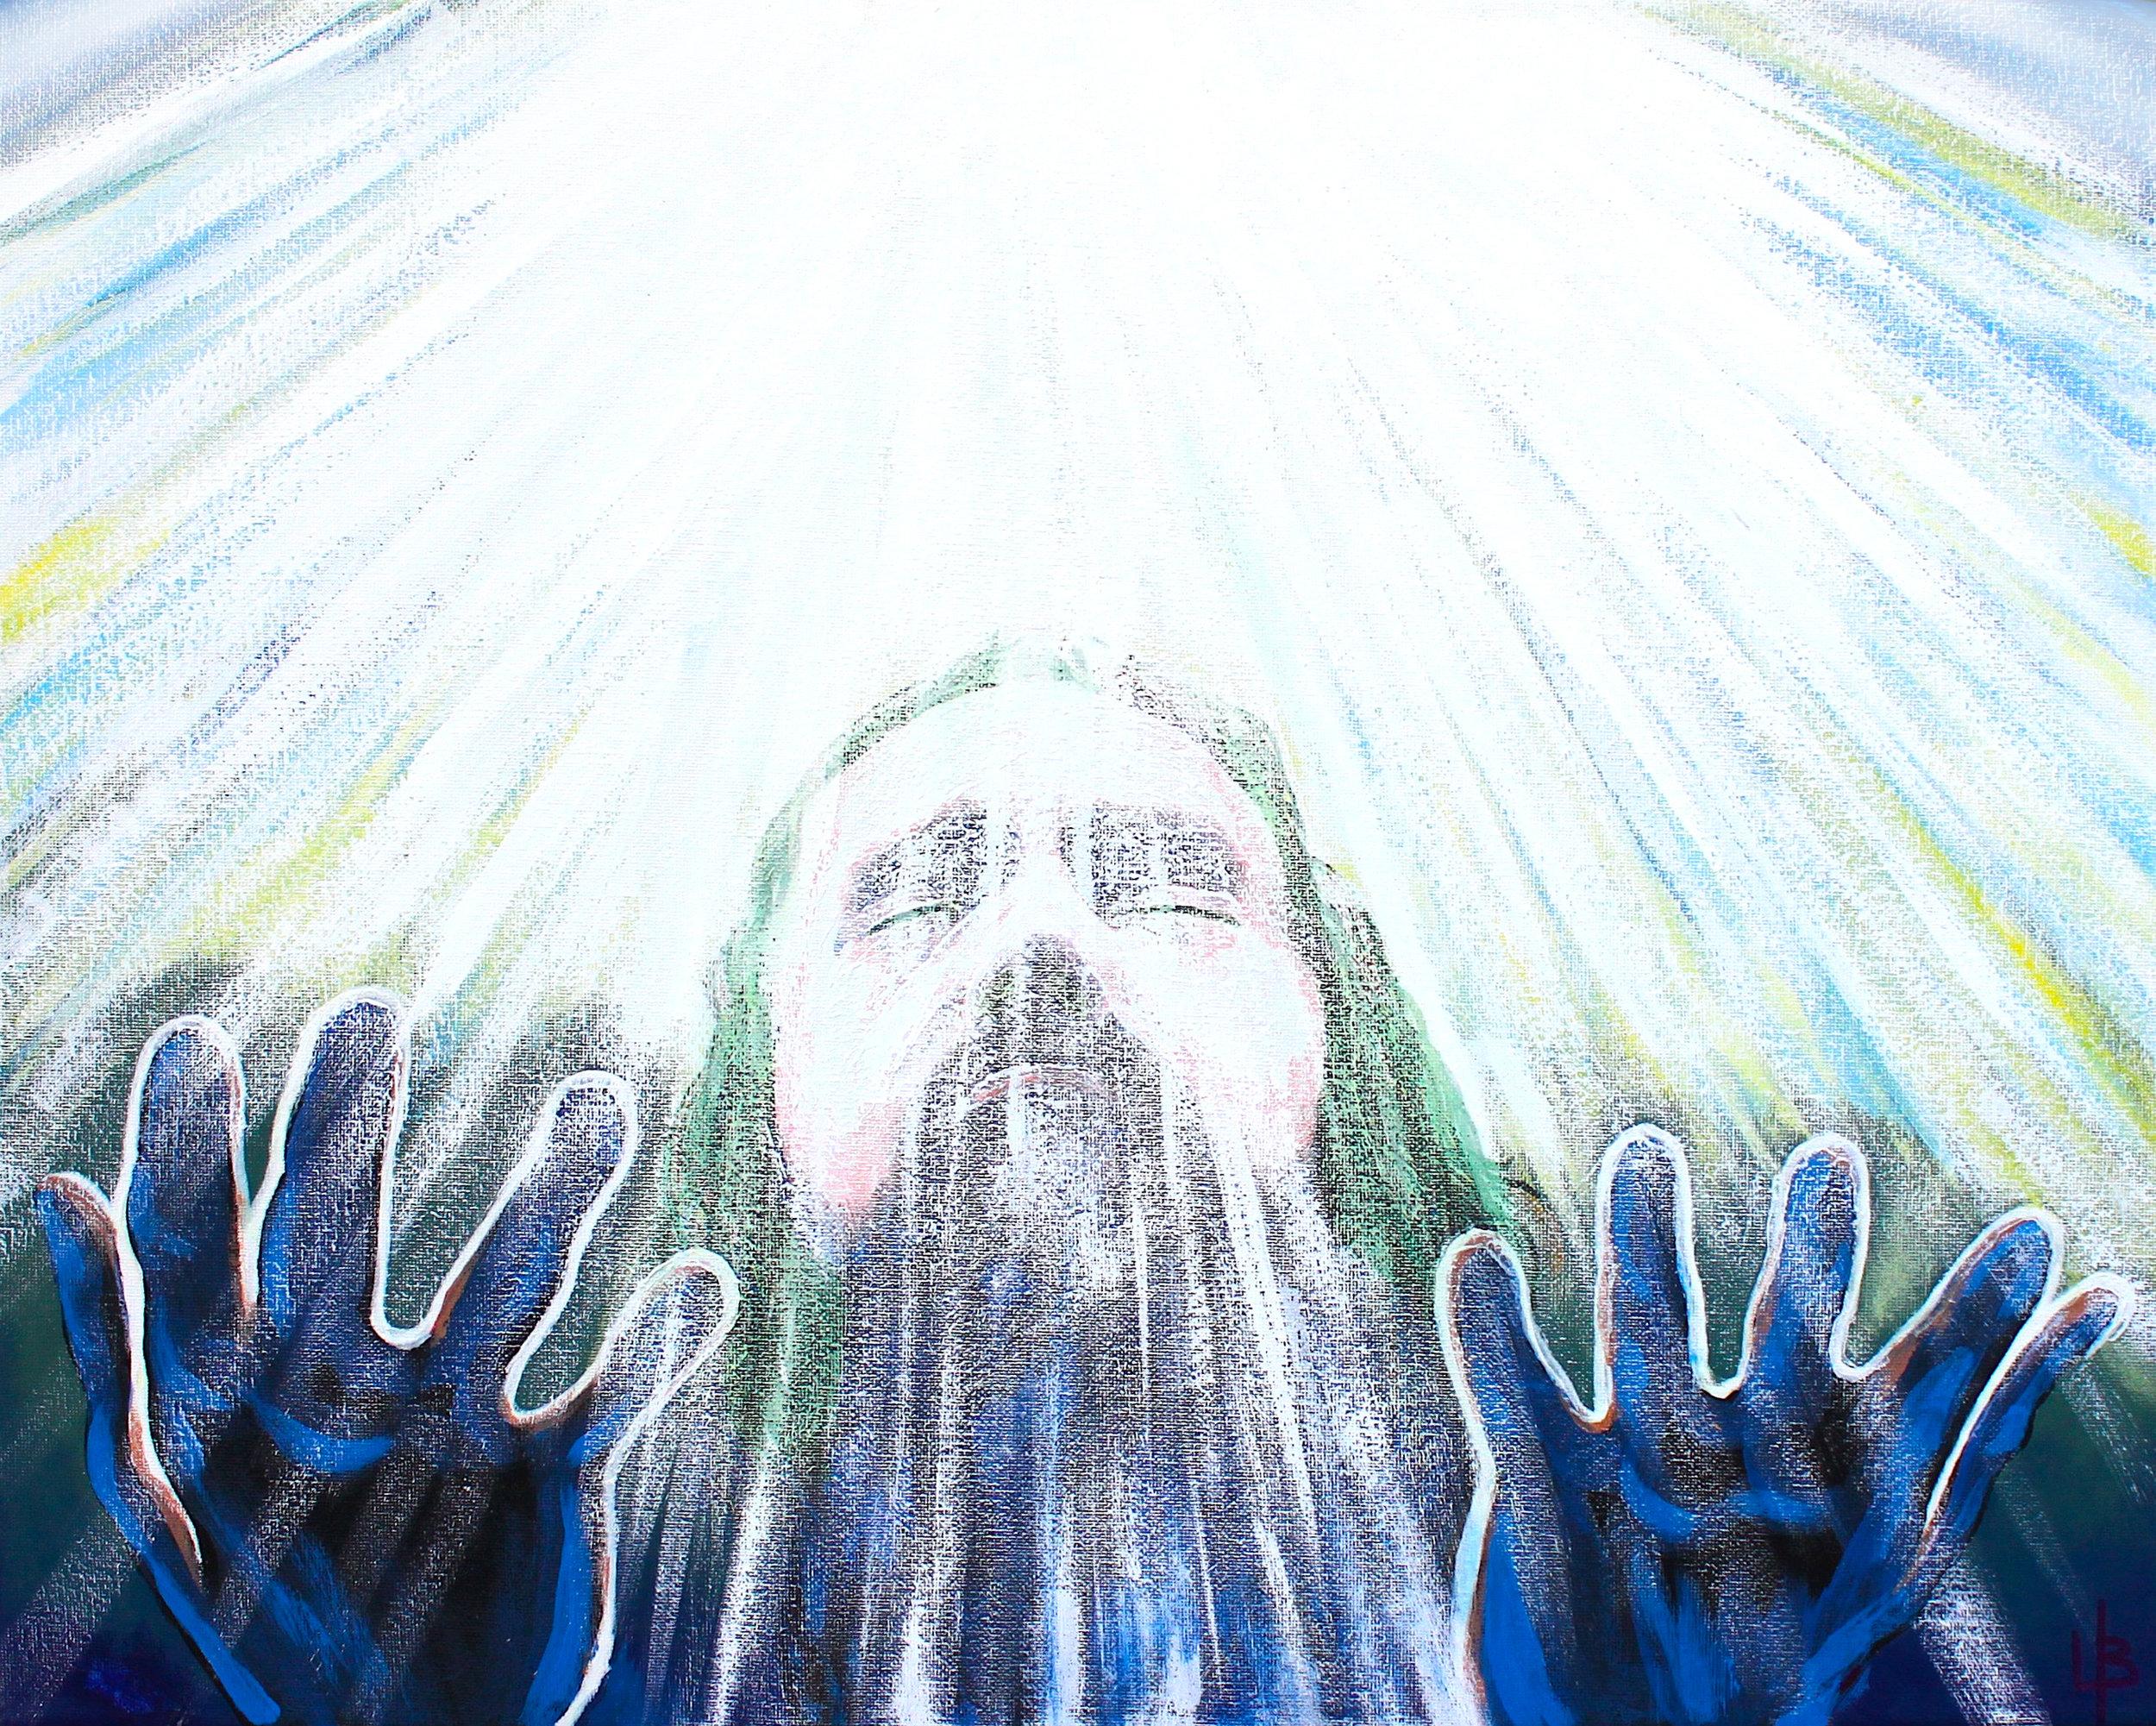 Worship - Art of Jesus Christ